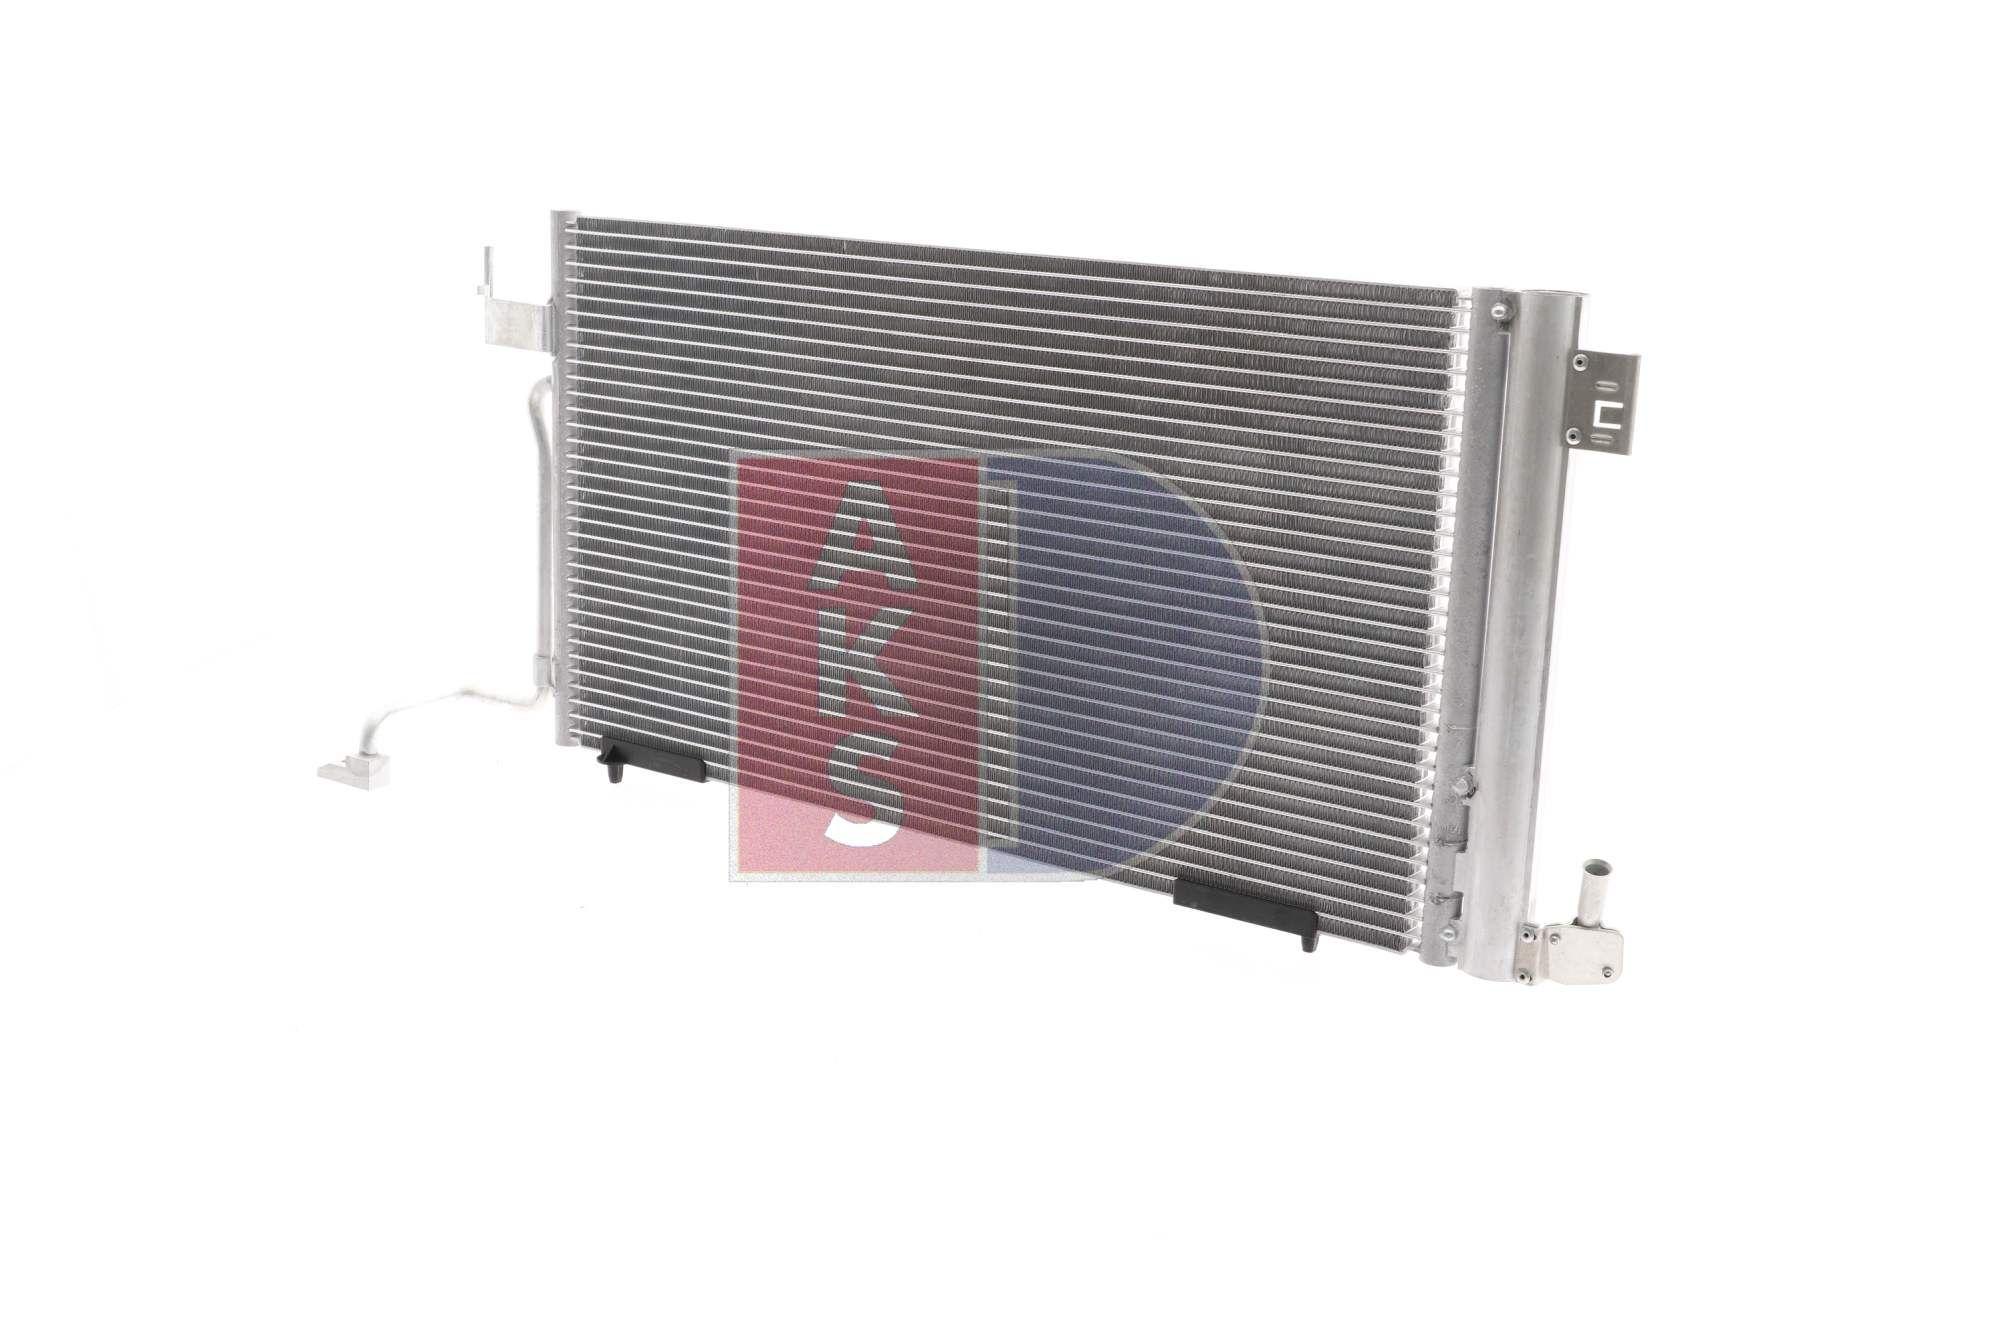 Klimakondensator 162310N AKS DASIS 162310N in Original Qualität